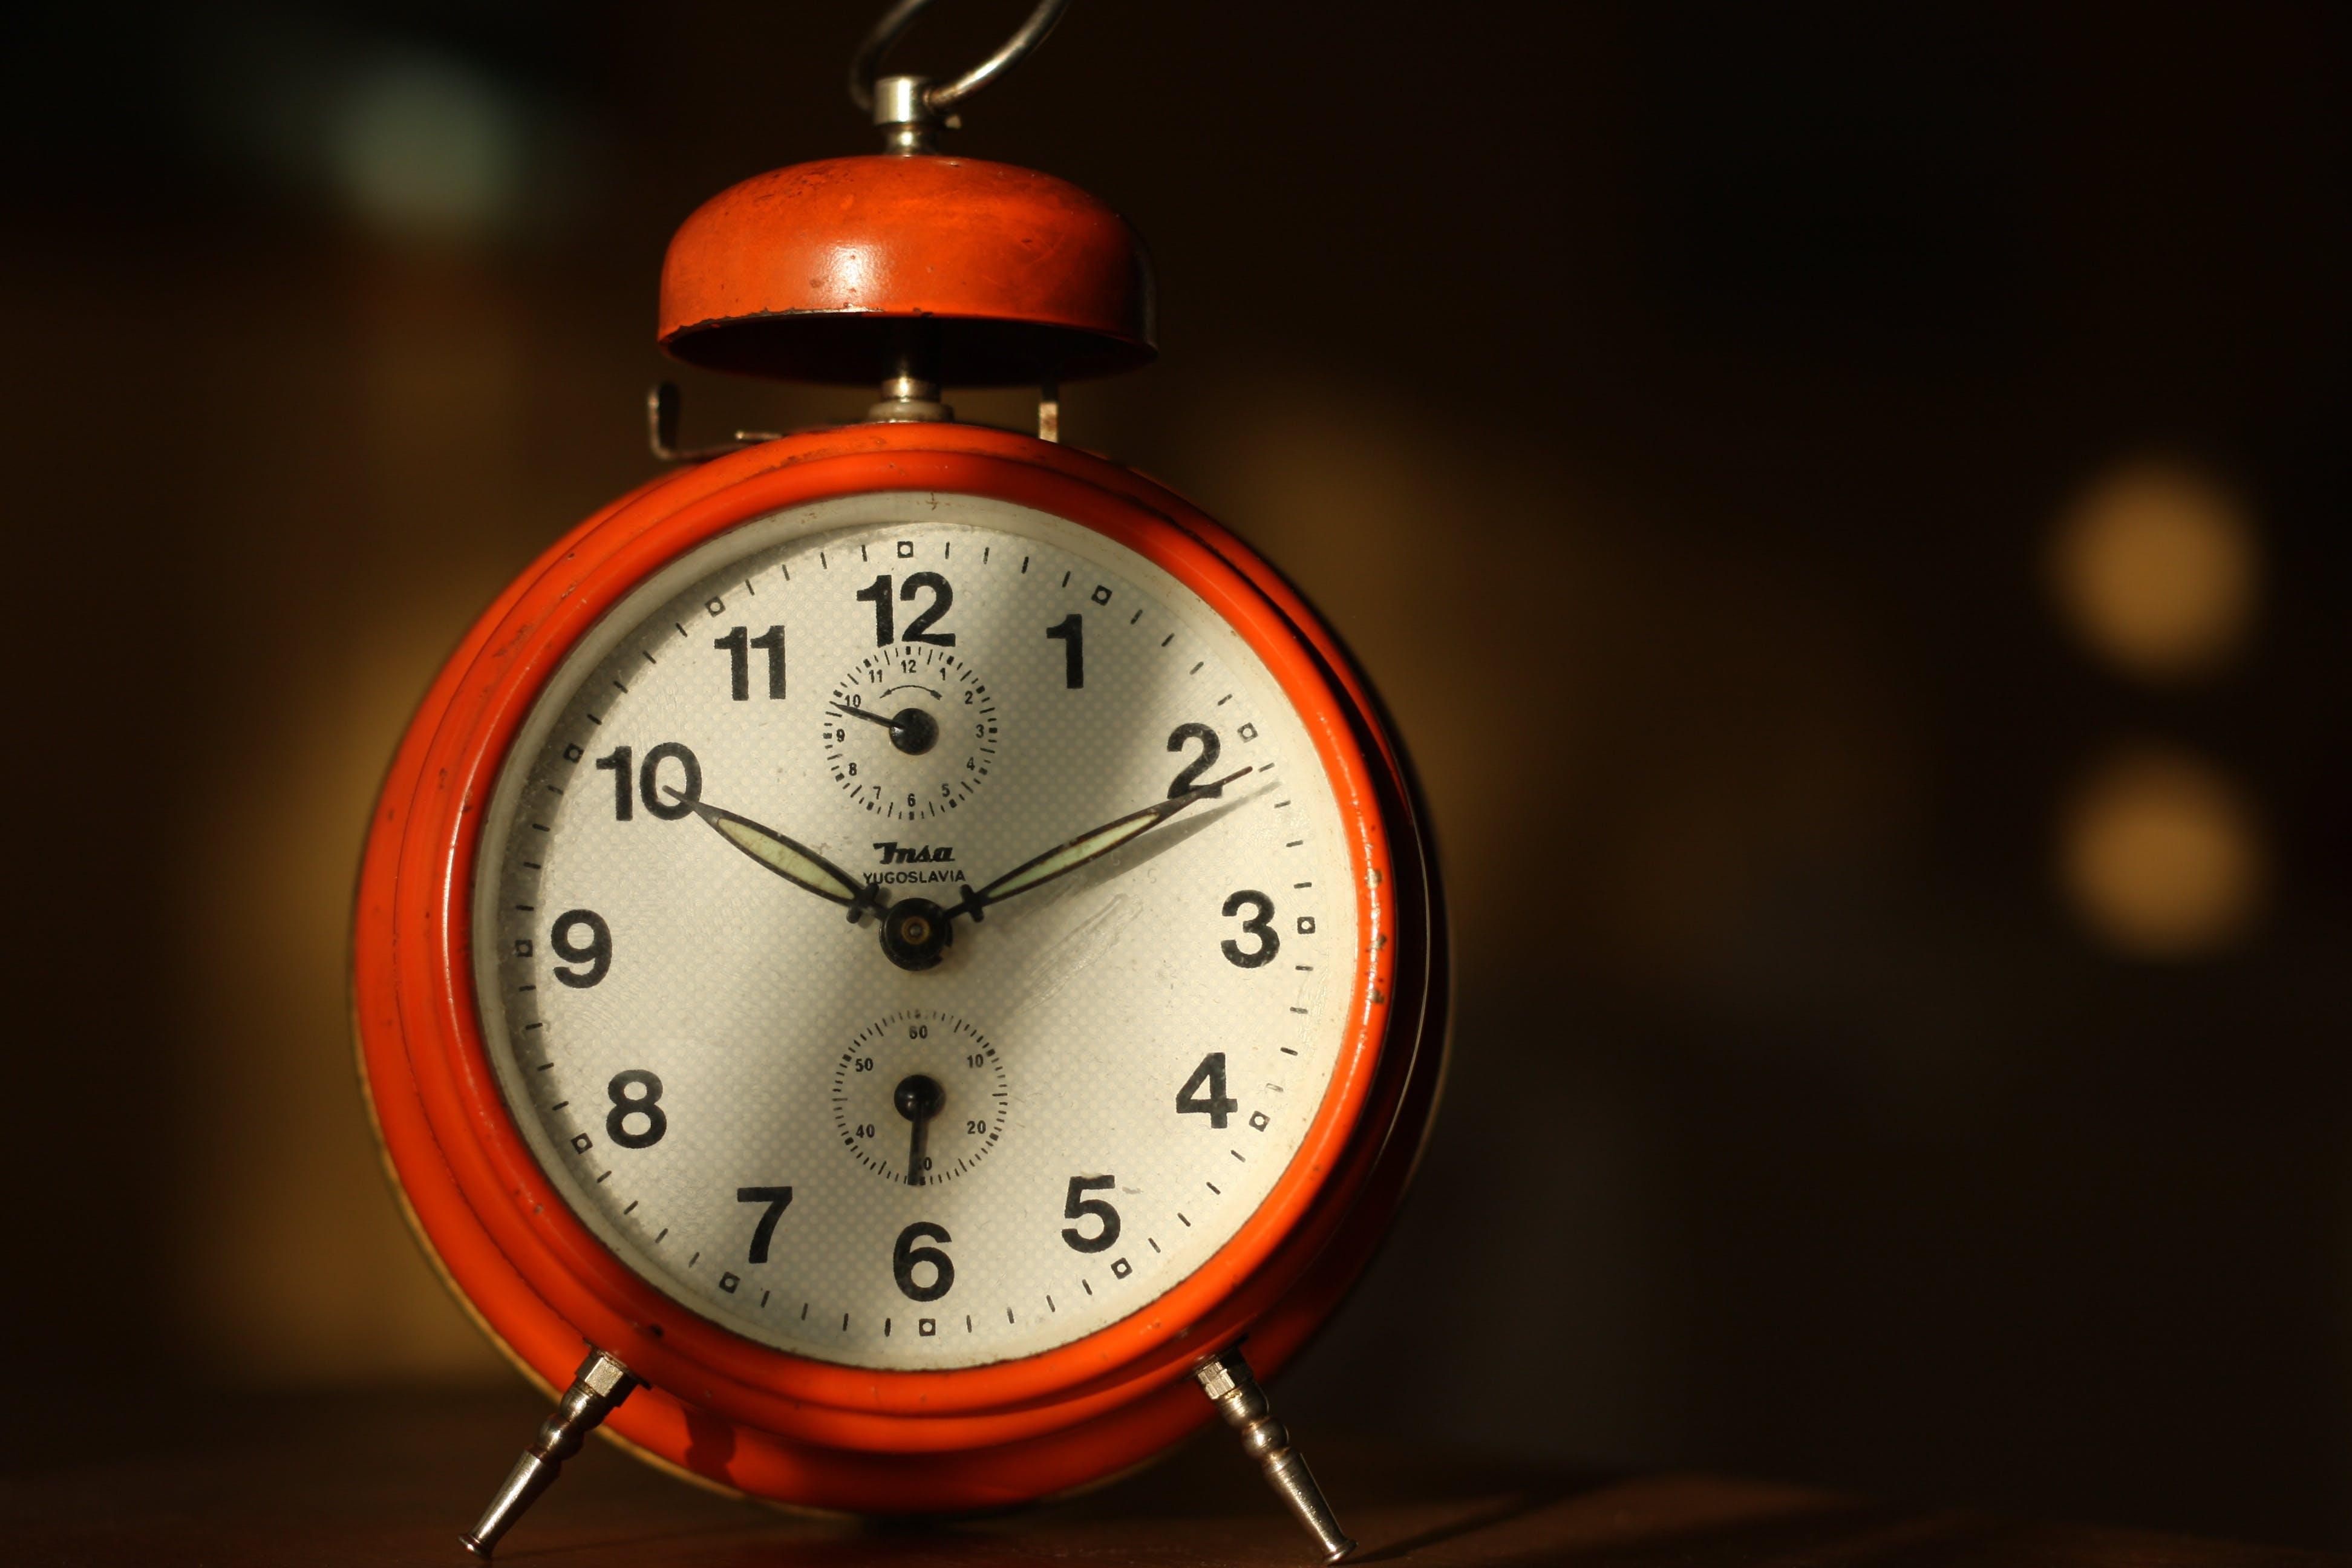 Red Alarm Clock at 10:11